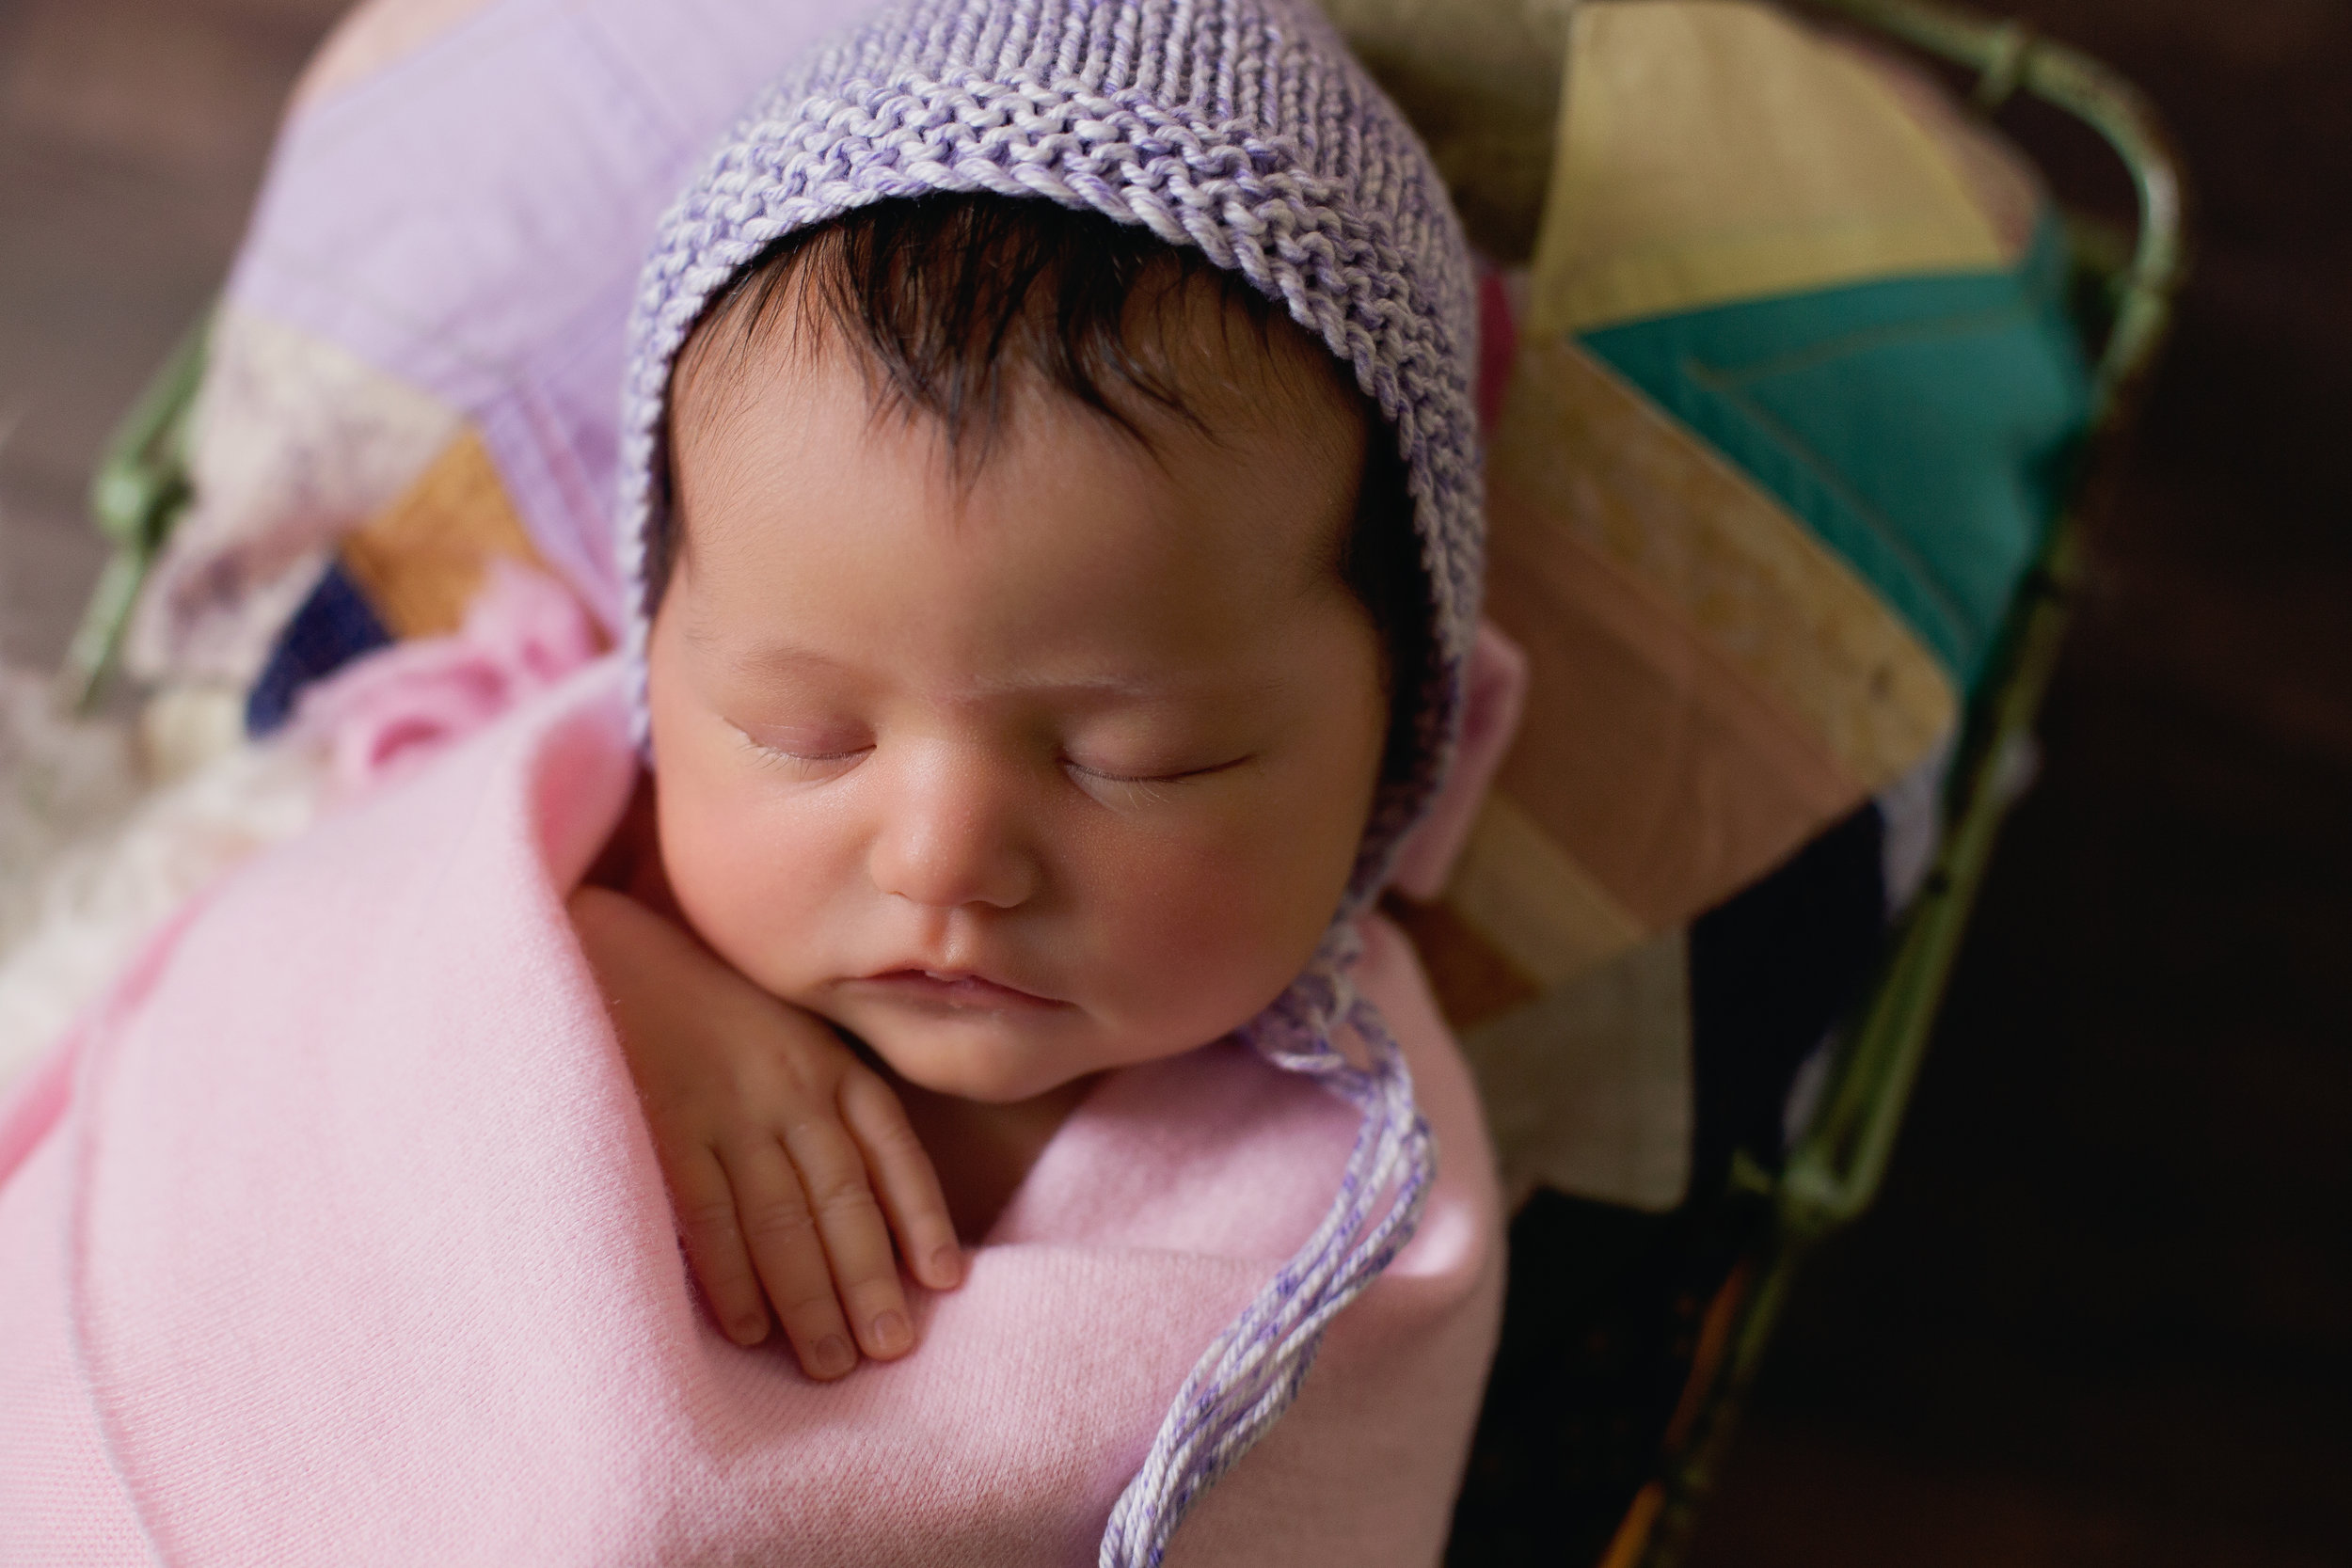 brisbane newborn photographyjpg